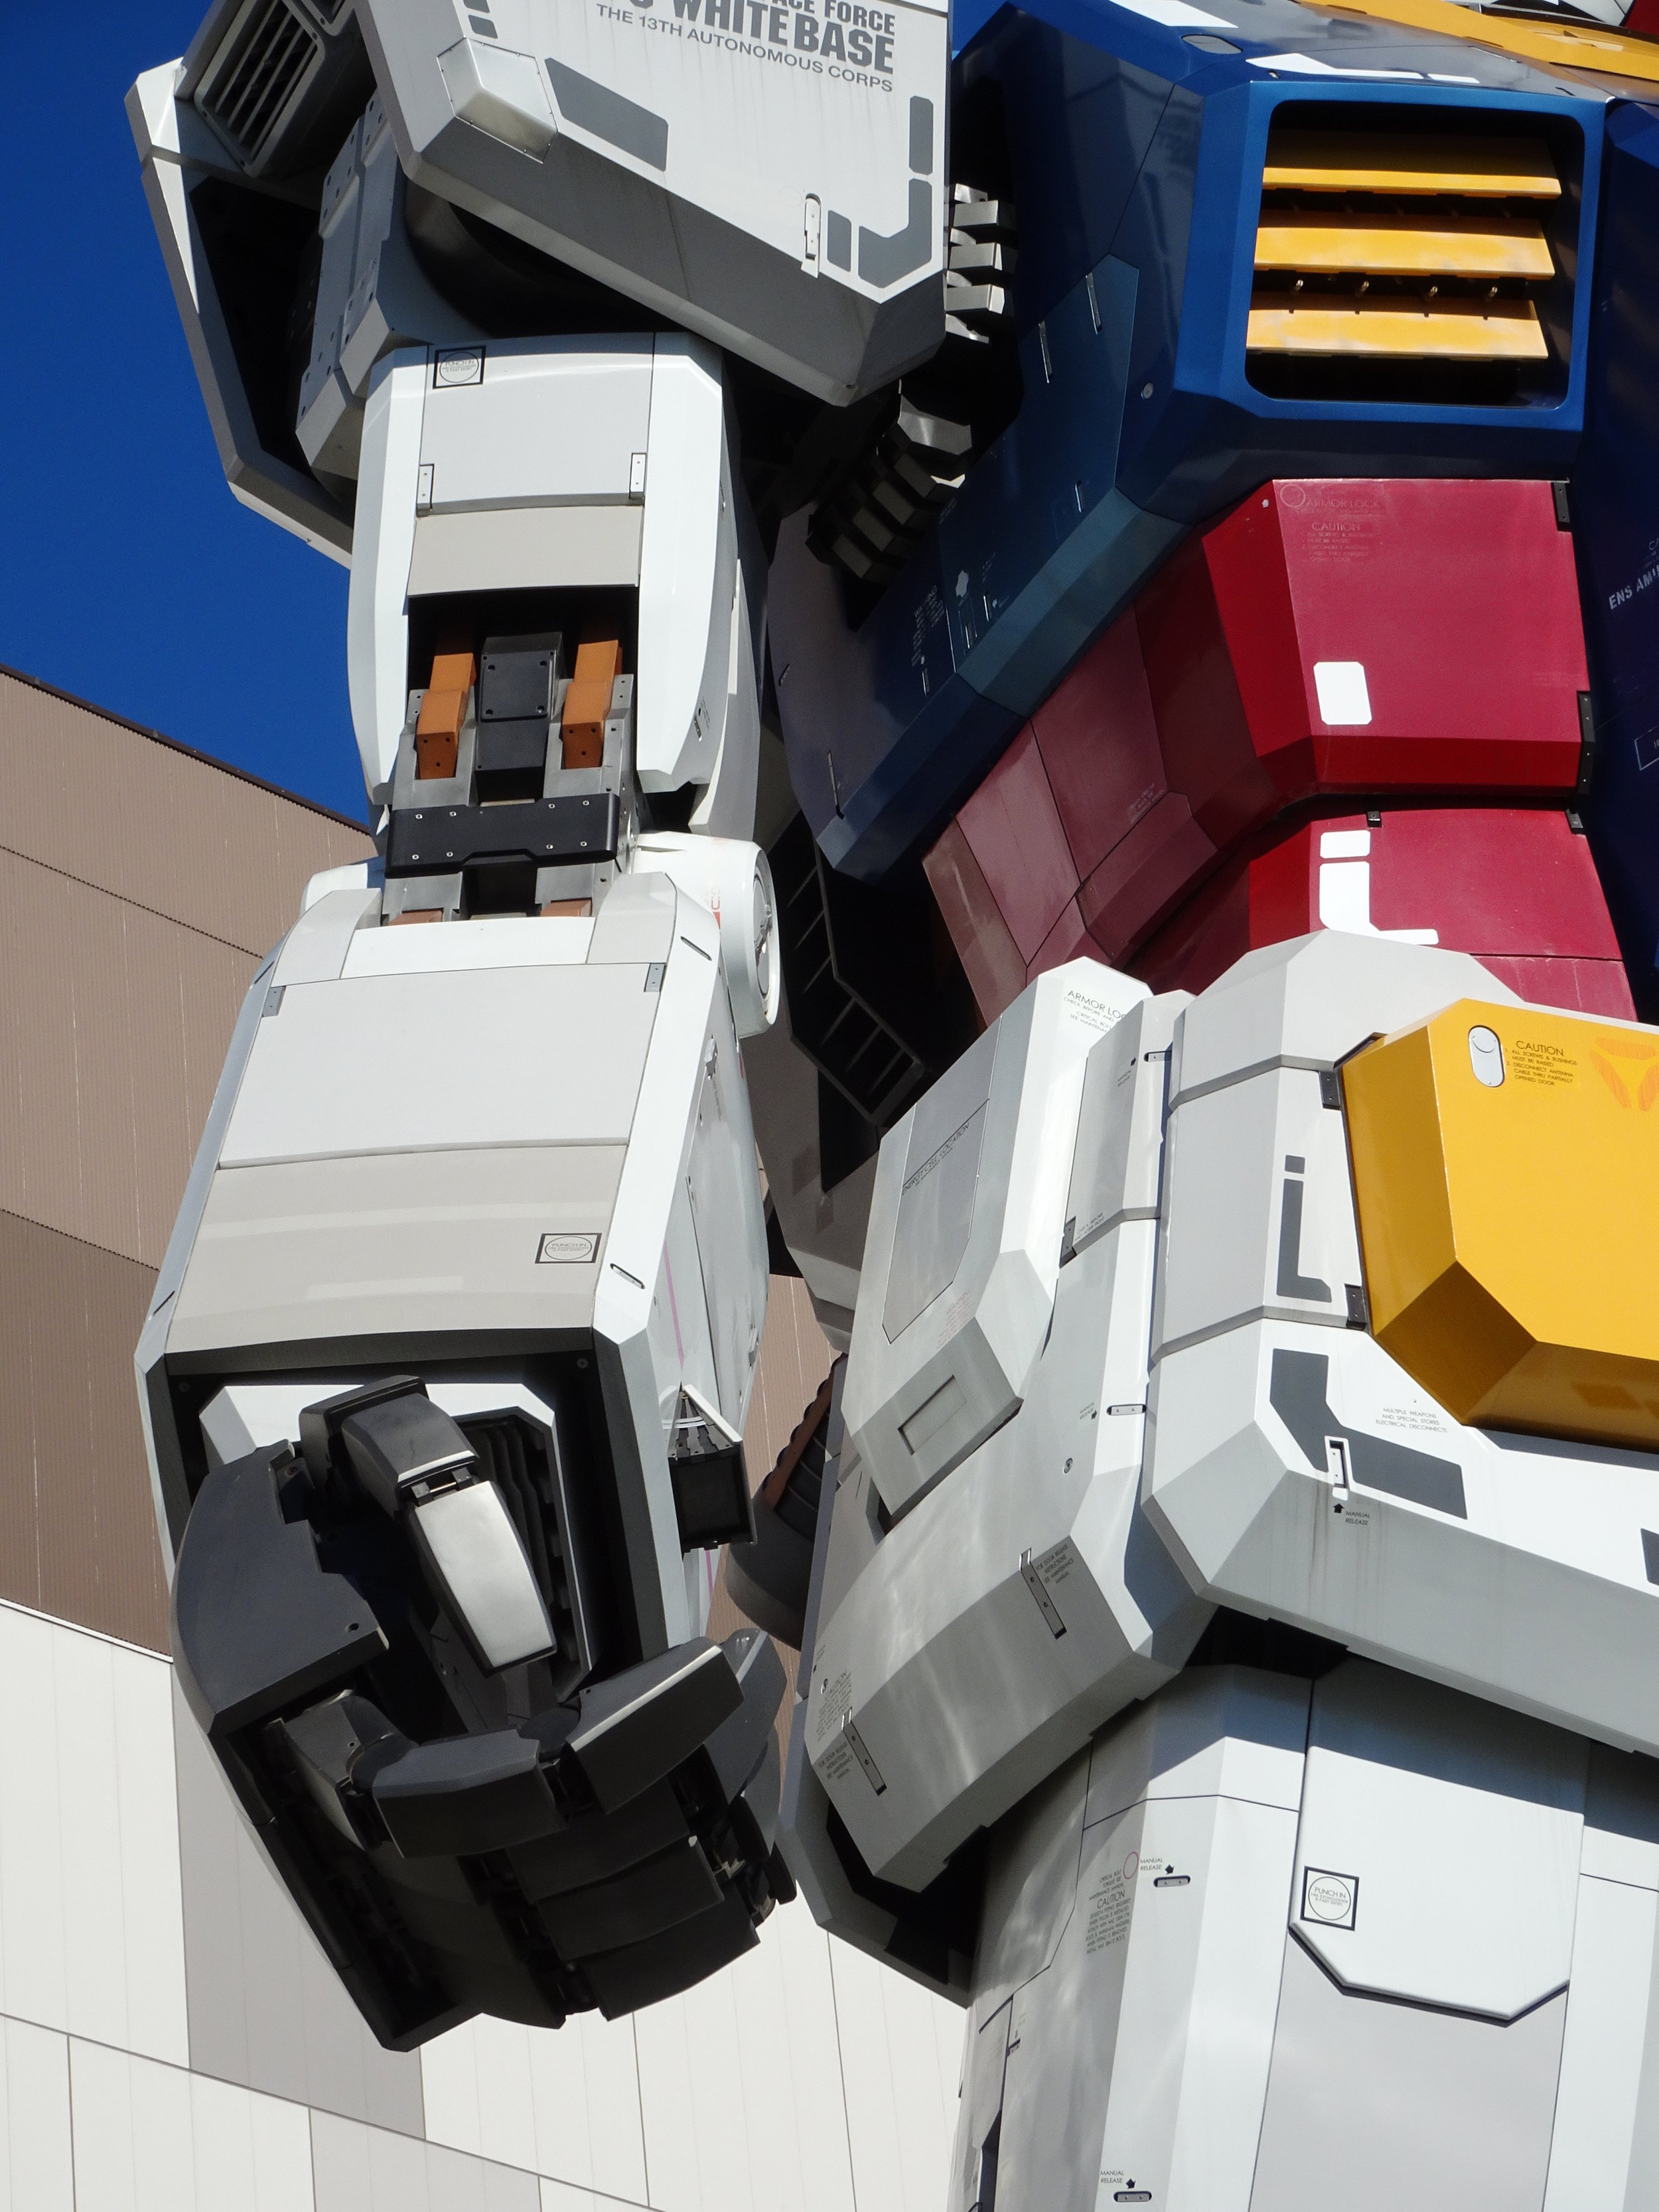 RX-78-2 Gundam 1-1 Statue - 020.jpg